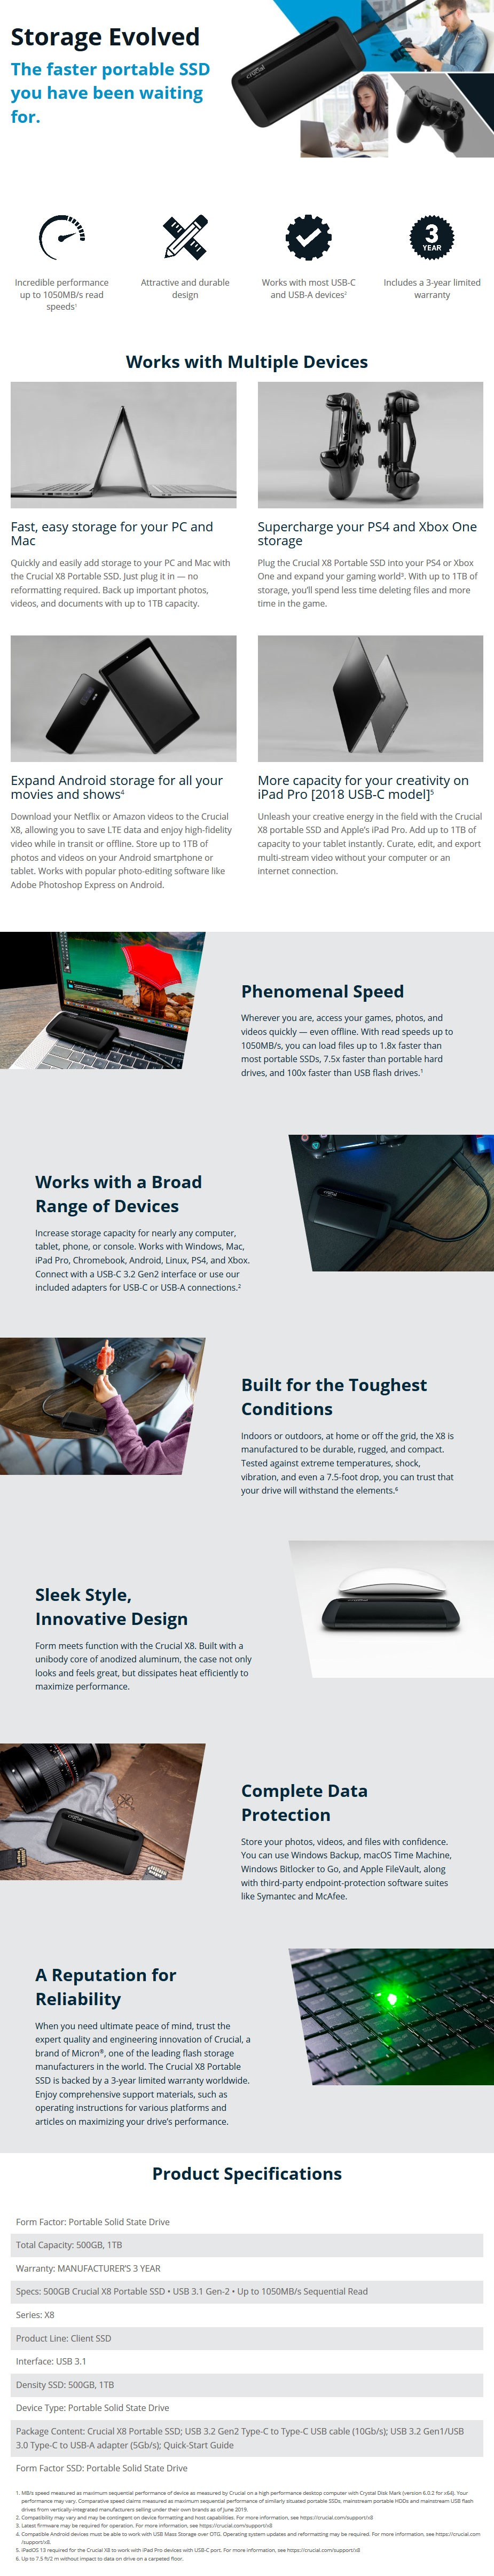 crucial-x8-500gb-usb-32-gen2-typec-external-portable-ssd-ct500x8ssd9-ac31096-4.jpg